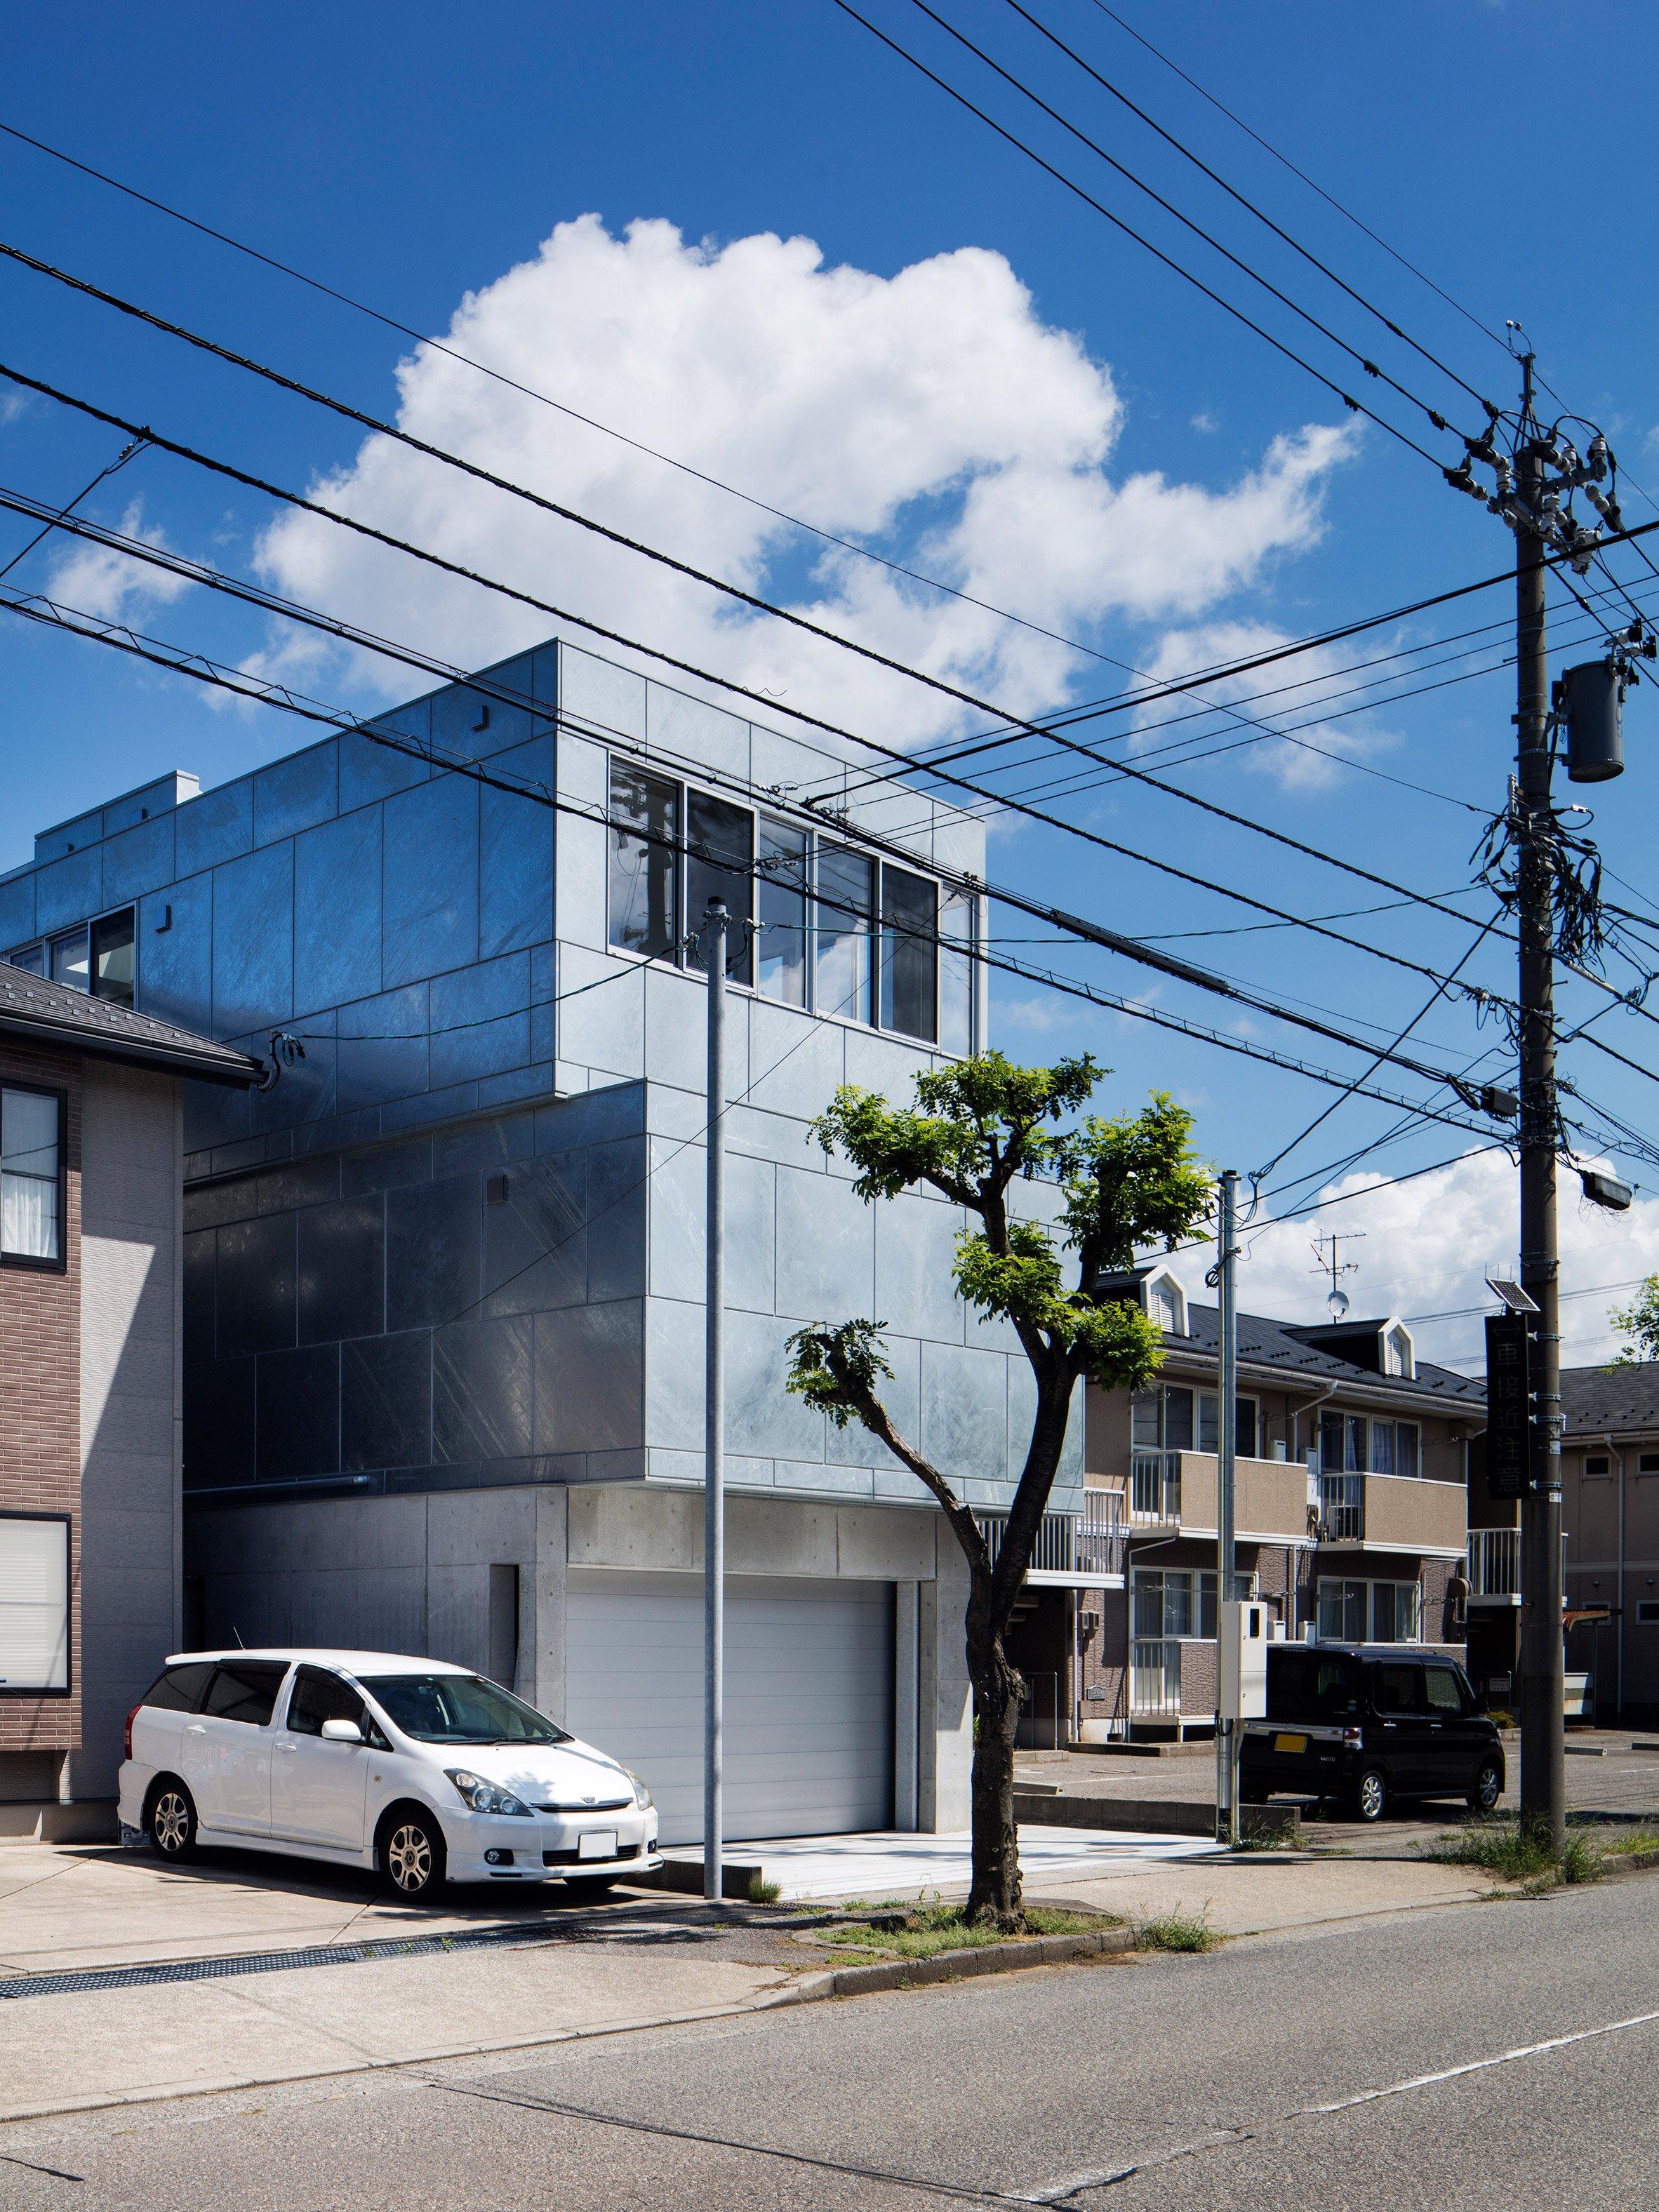 Shinbohon House K by Yuichi Yoshida and associates